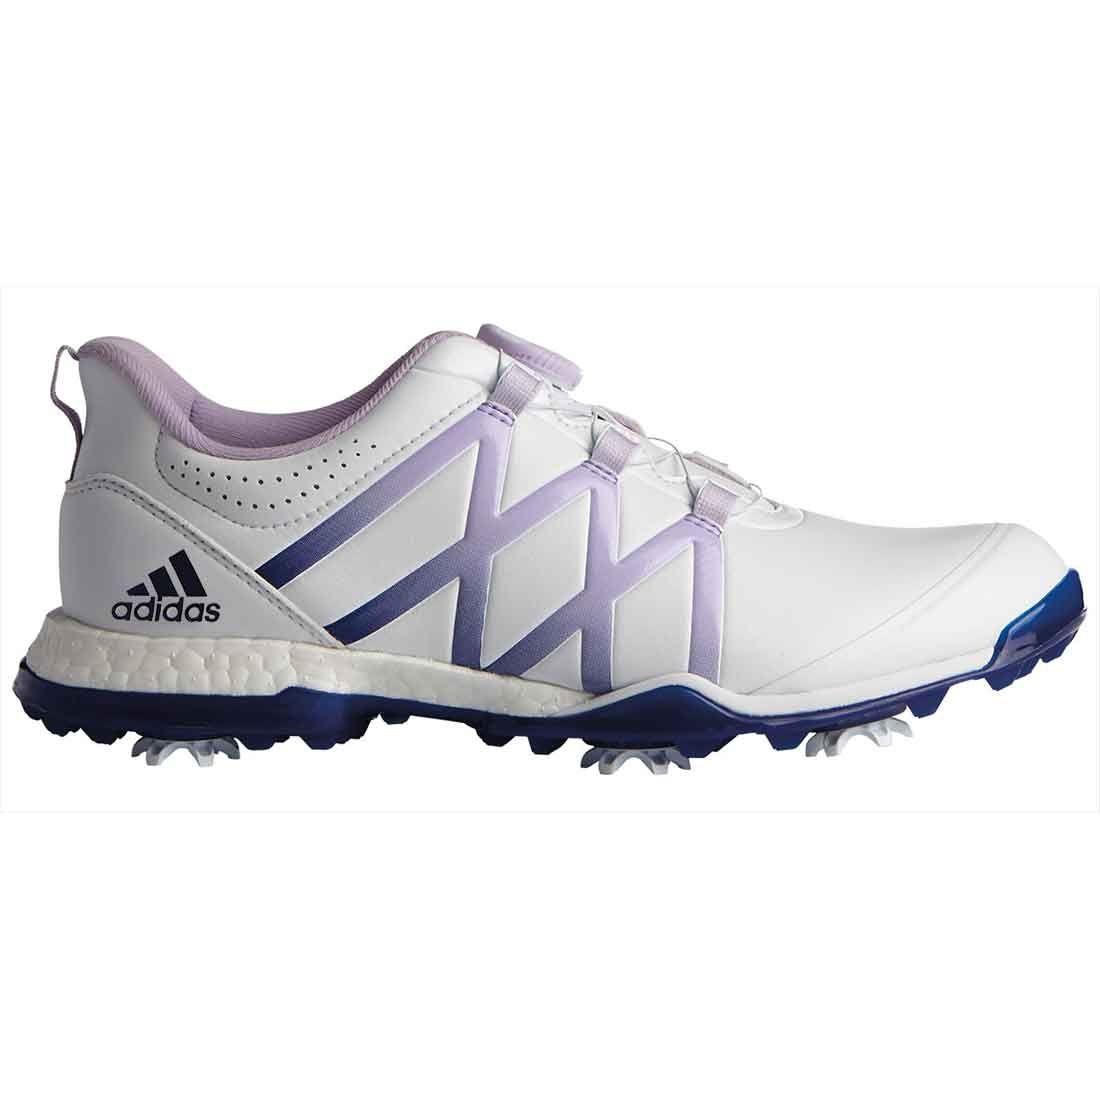 Buy Adidas Women's AdiPower Boost Boa Golf Shoes White/Purple Glow ...